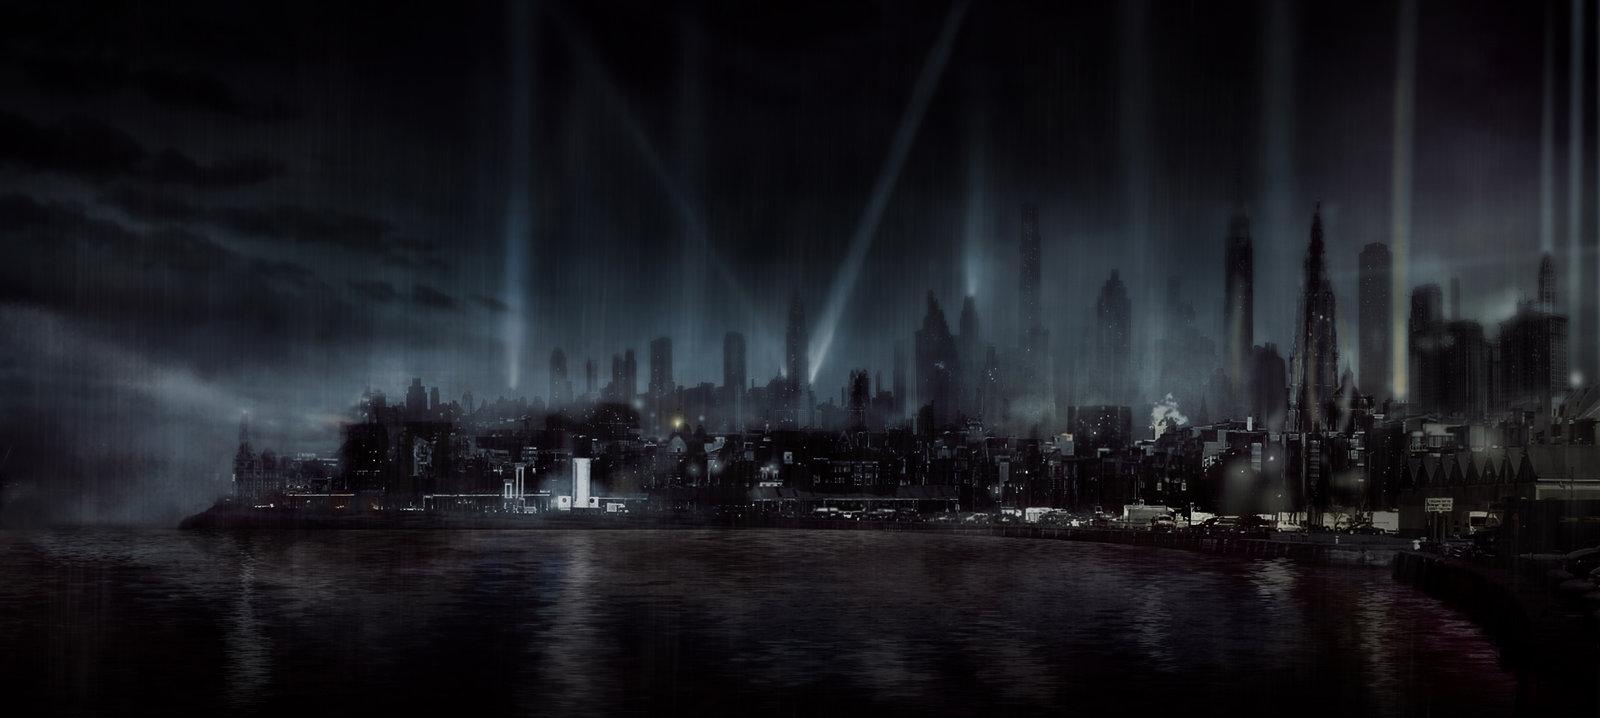 Film noir city by silberius d72eui1